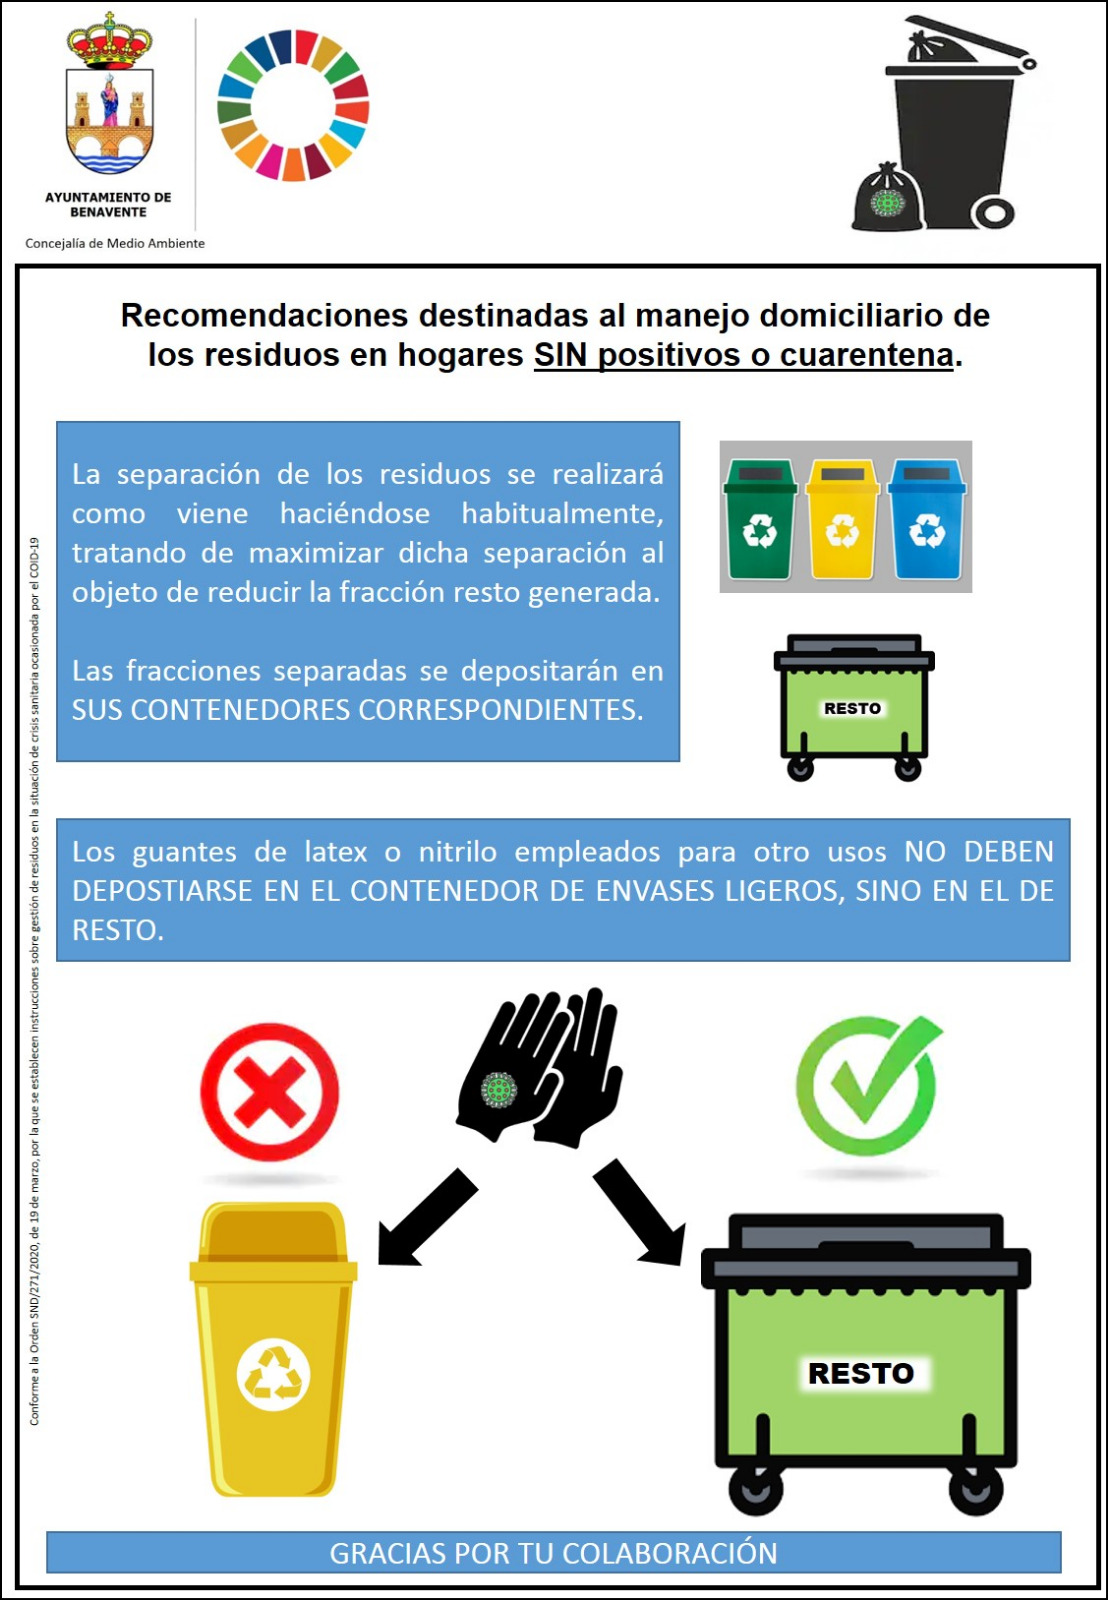 Residuos sin coronavirus